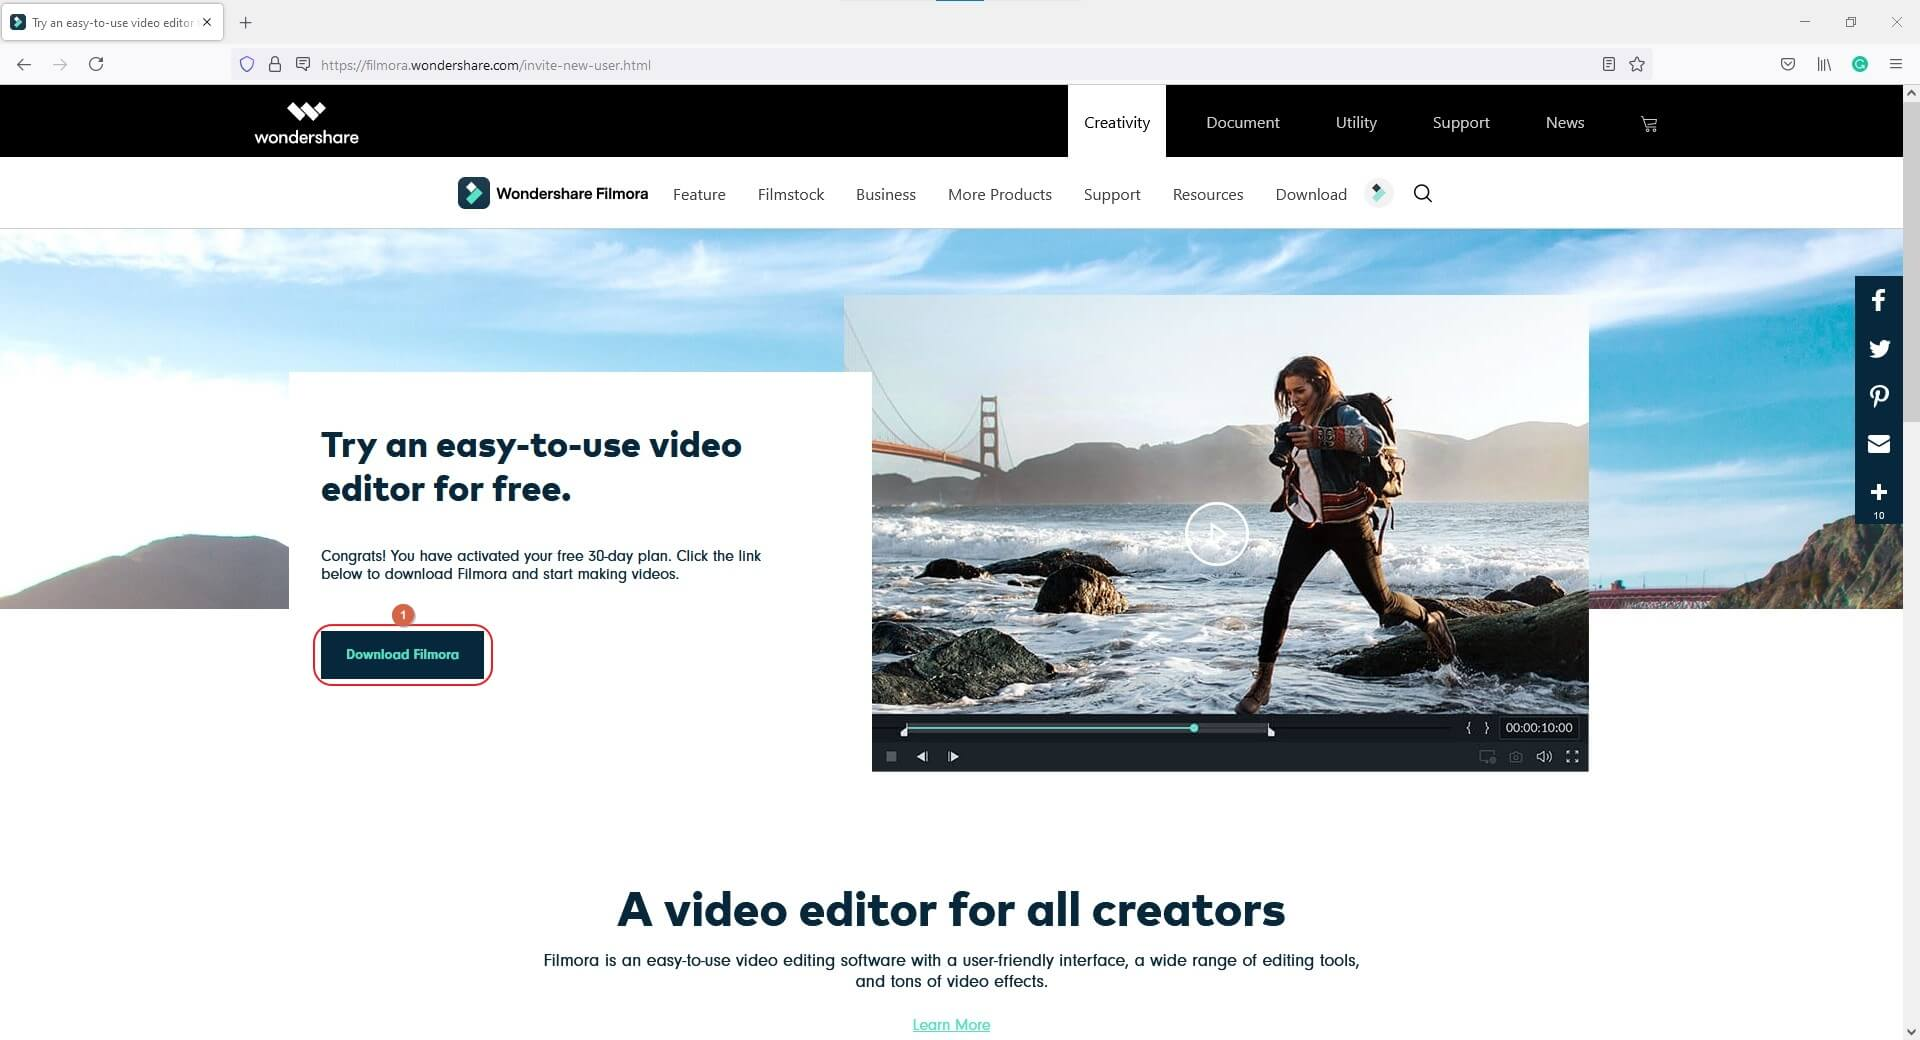 Get Free Wondershare Filmora without Crack